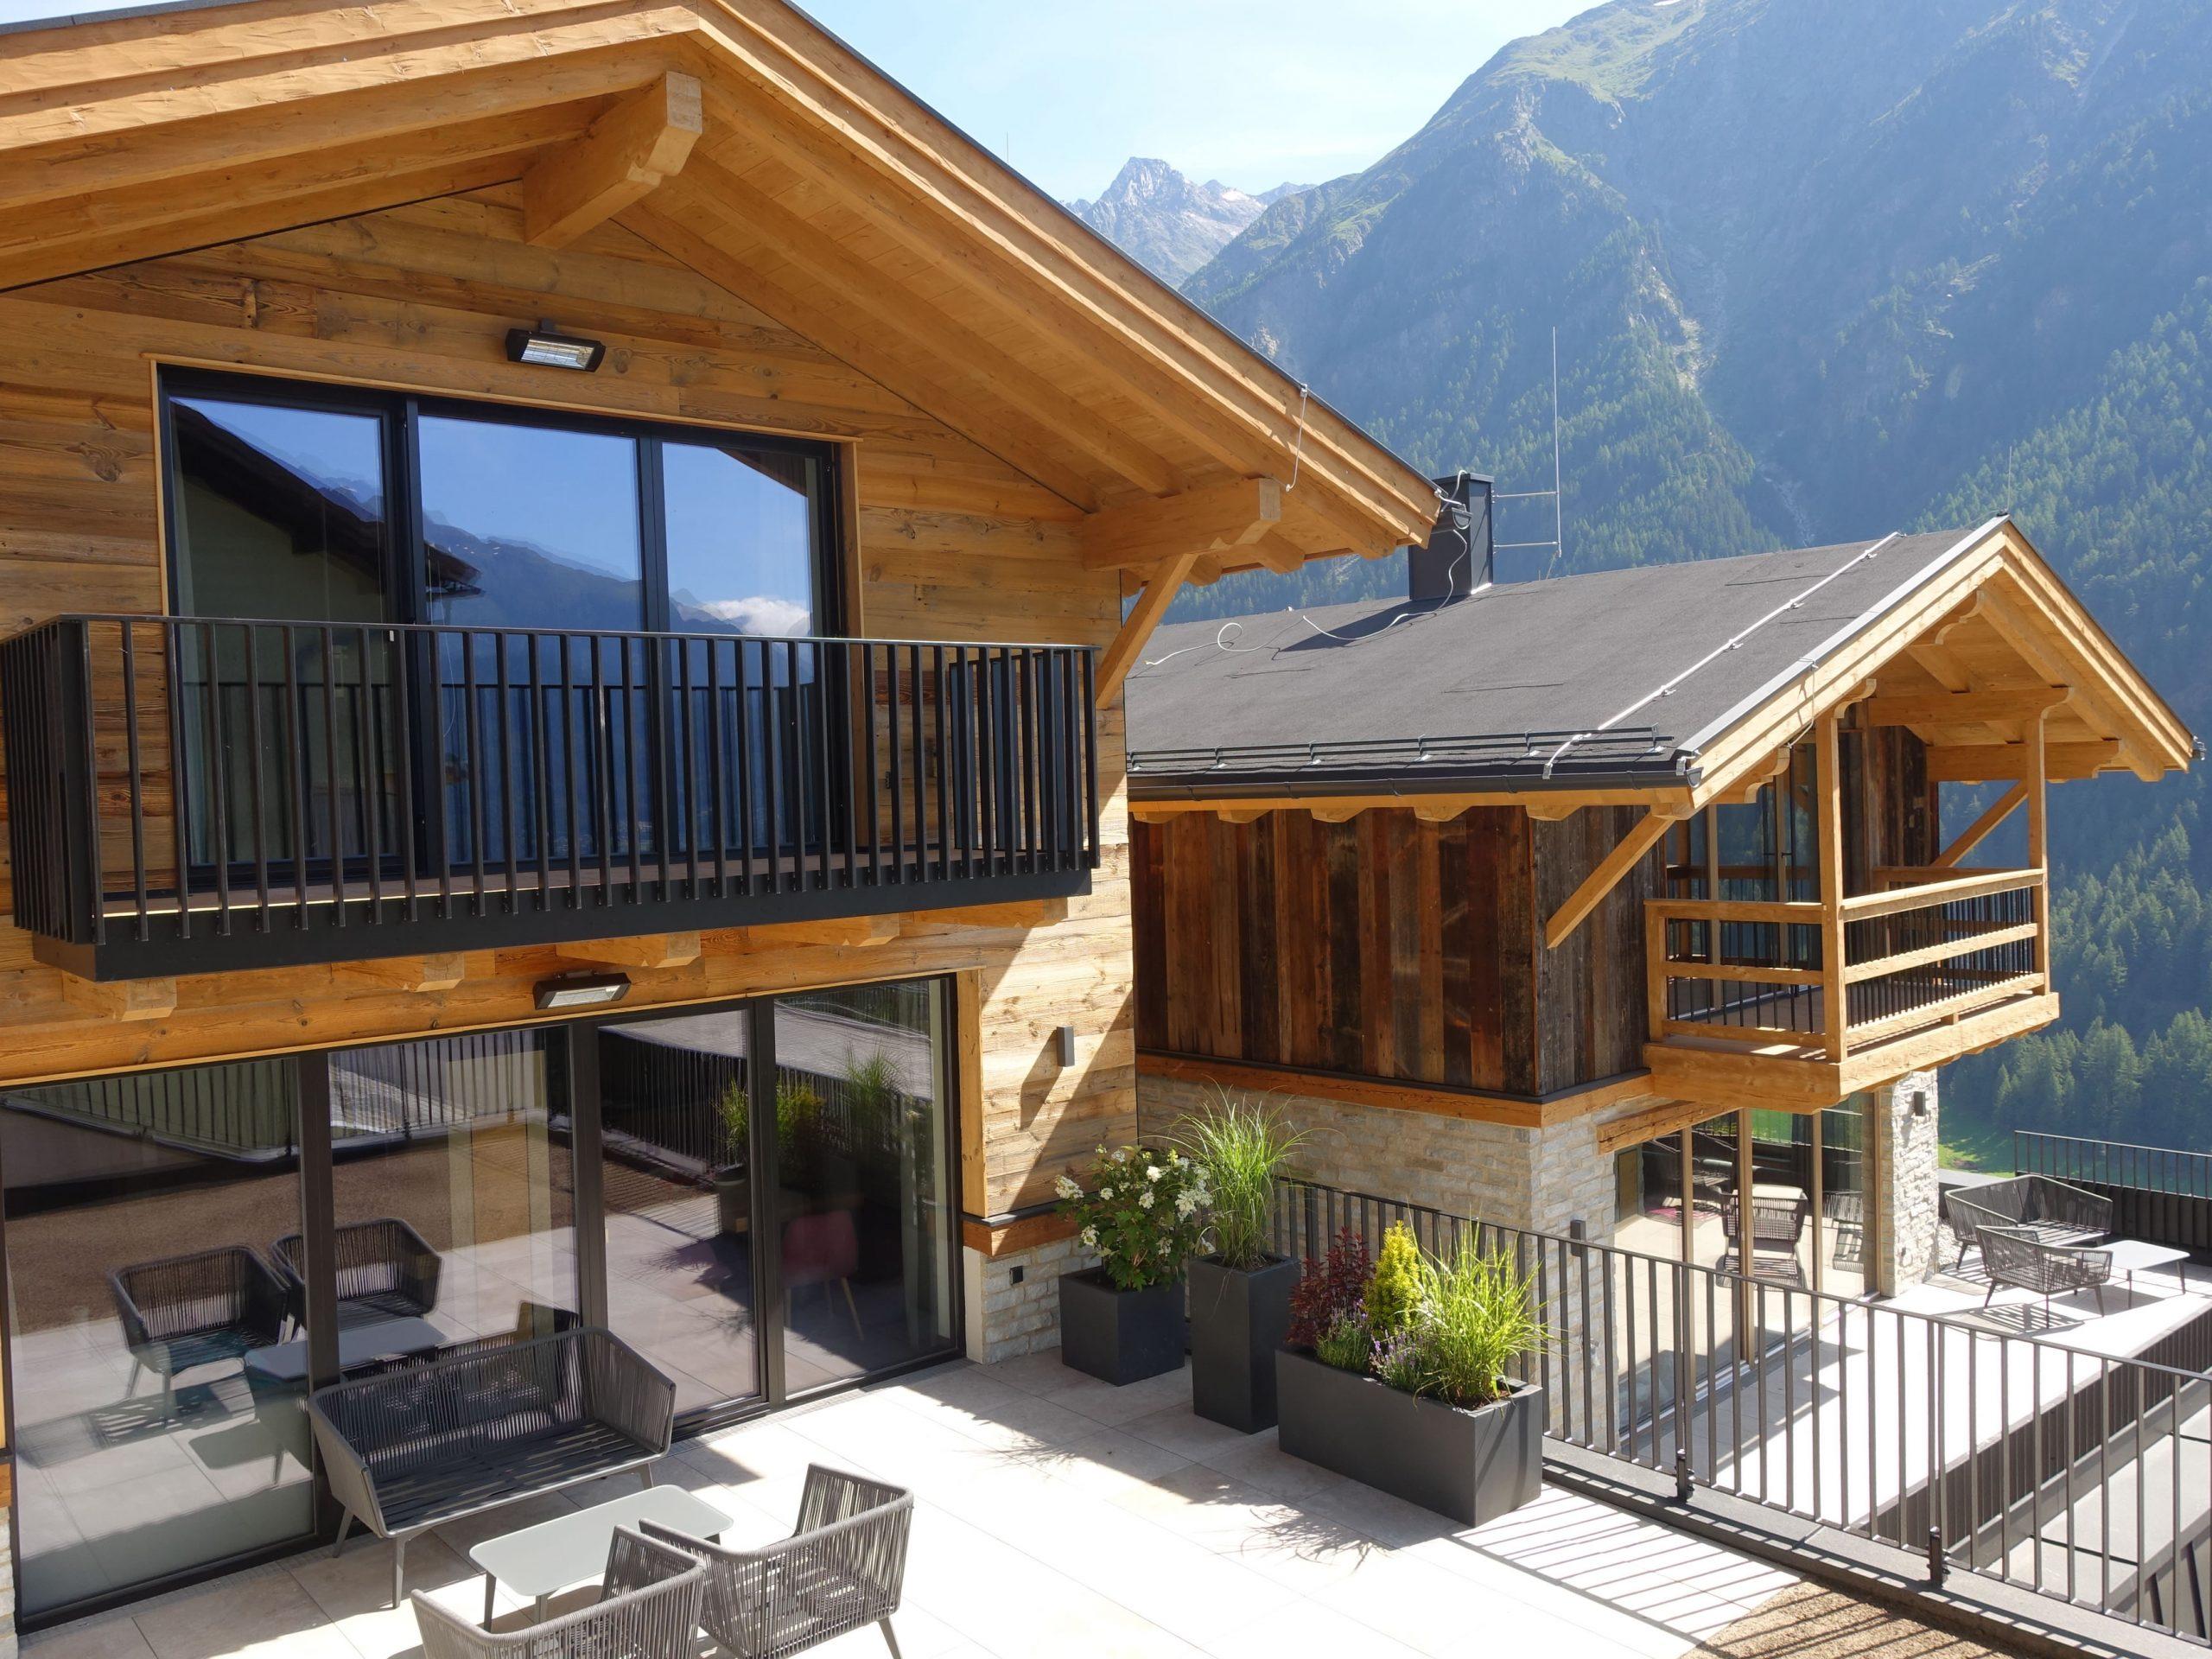 Chalet-appartement The Peak Ötztaler Alpen - 2-3 personen